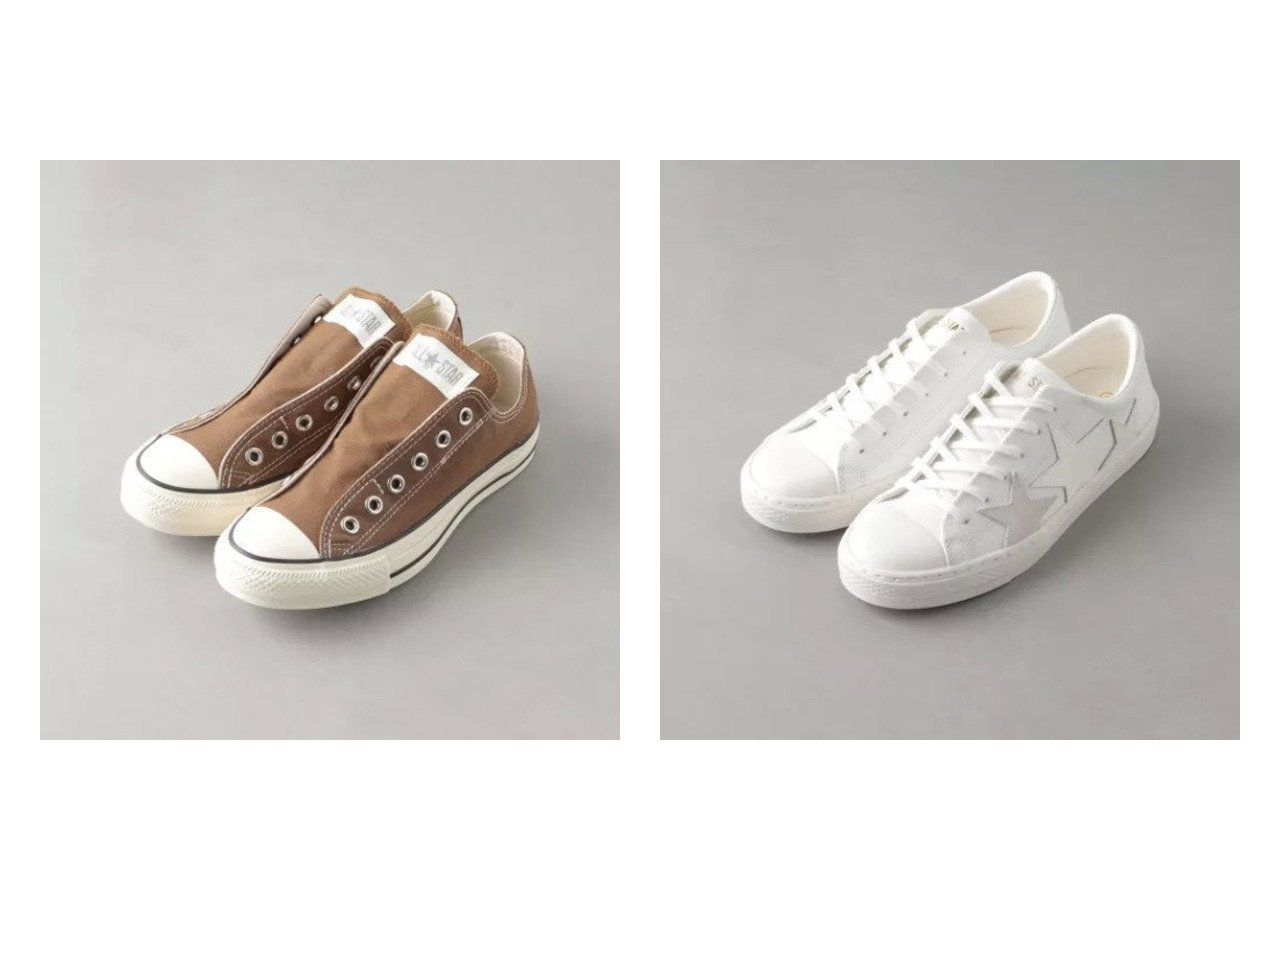 【Odette e Odile/オデット エ オディール】のCONVERSE オールスター スリップ III OX&CONVERSE オールスター クップ トリオスター OX シューズ・靴のおすすめ!人気、トレンド・レディースファッションの通販  おすすめで人気の流行・トレンド、ファッションの通販商品 メンズファッション・キッズファッション・インテリア・家具・レディースファッション・服の通販 founy(ファニー) https://founy.com/ ファッション Fashion レディースファッション WOMEN シューズ スニーカー レース |ID:crp329100000010836